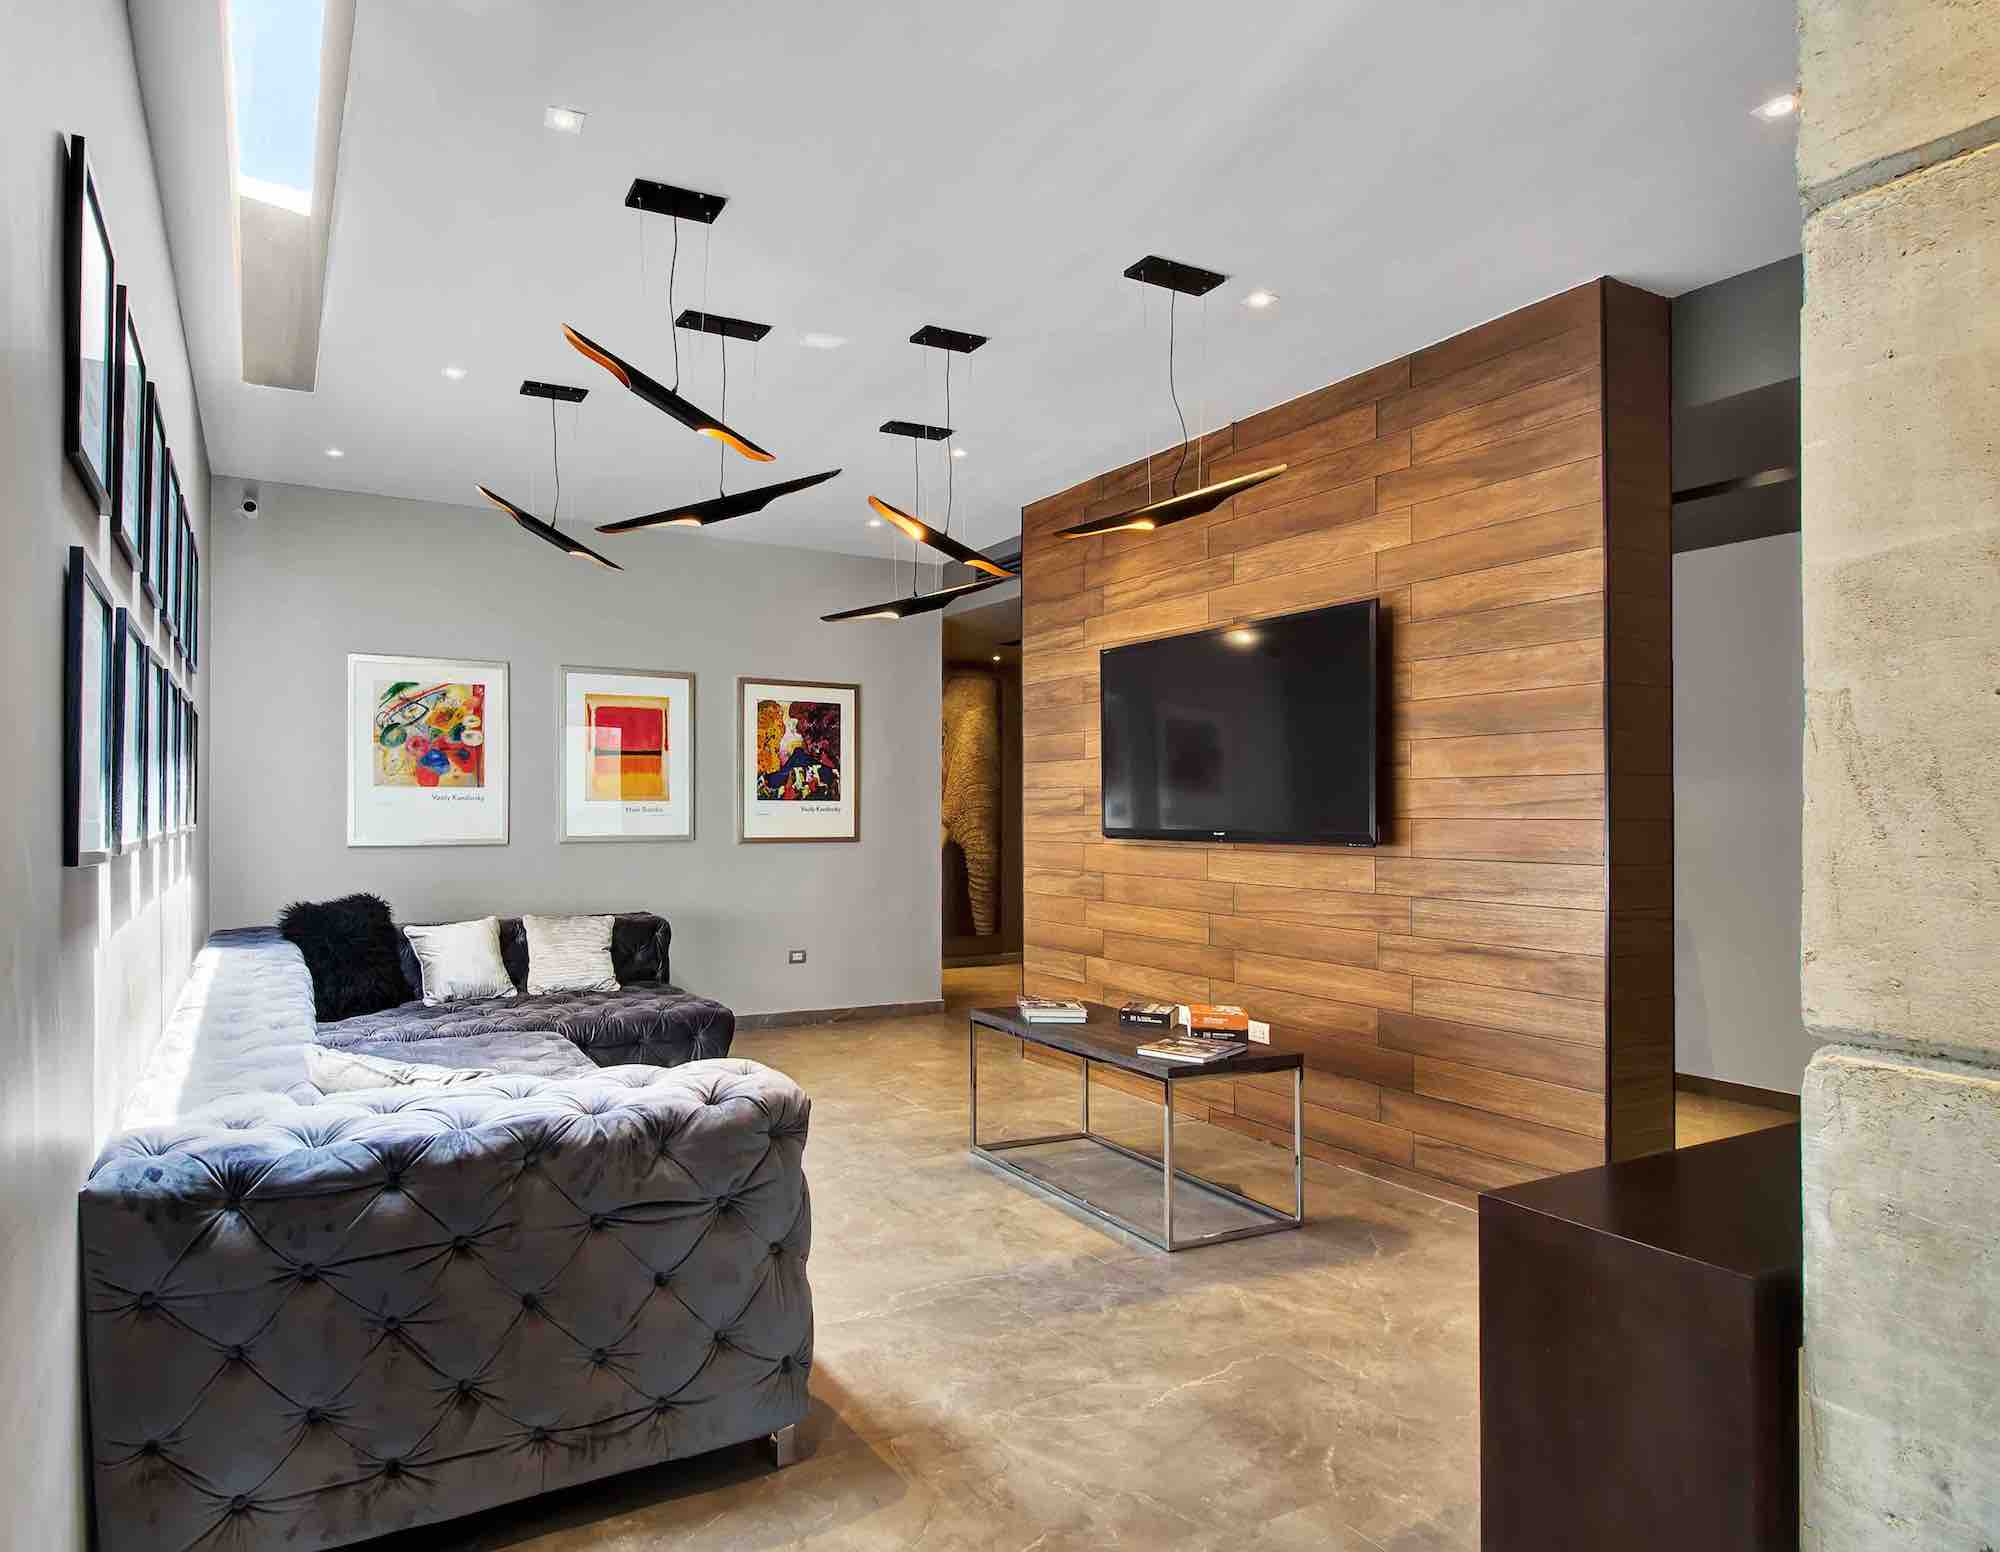 GR_House_Gallardo_arquitectura_amazingarchitecture_mexico_016.jpg